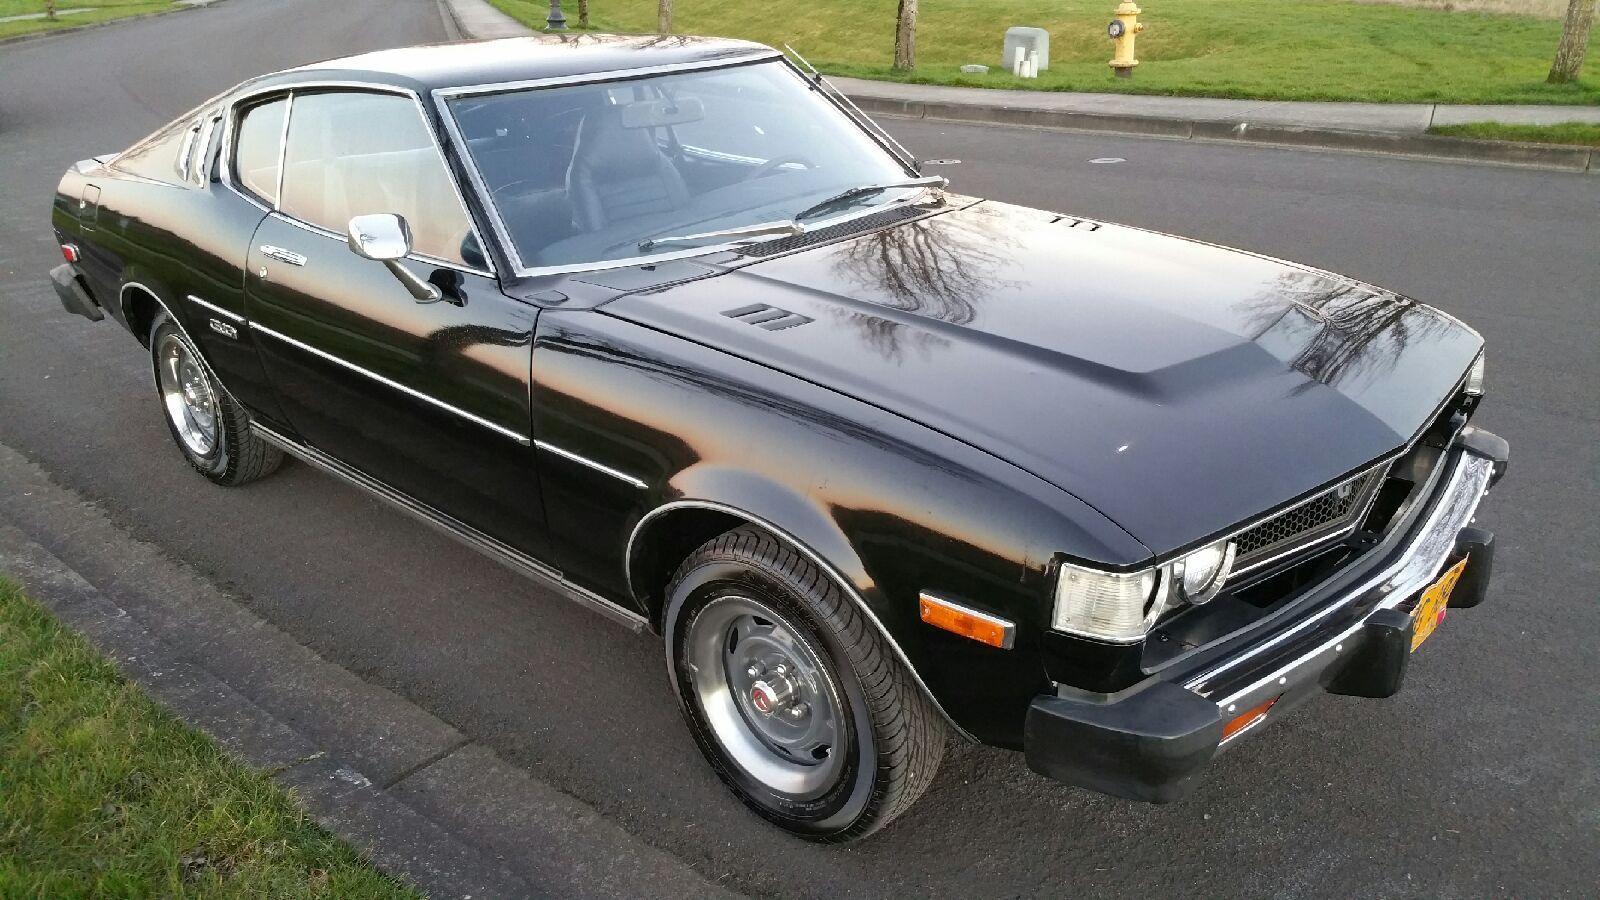 1977 Toyota Celica Gt Liftback Low Miles Coupe 5 Speed Manual 1978 1973 2000